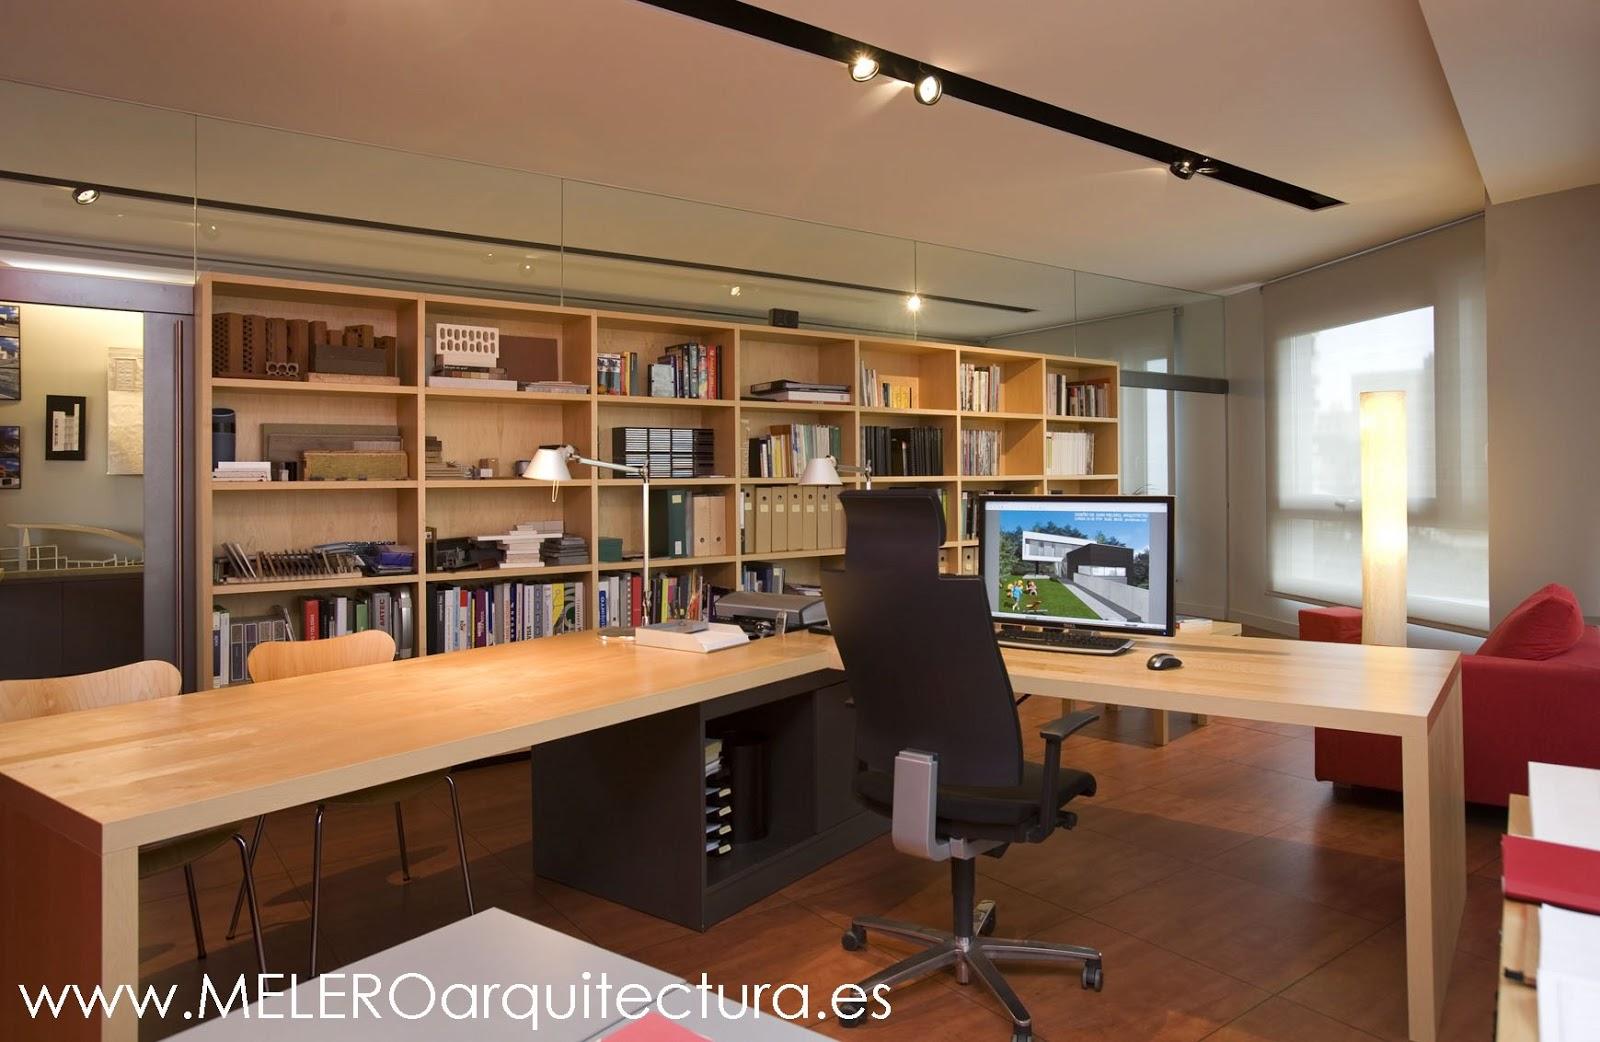 Melero arquitectura nuestra oficina ii proyecto de for Despacho arquitectura